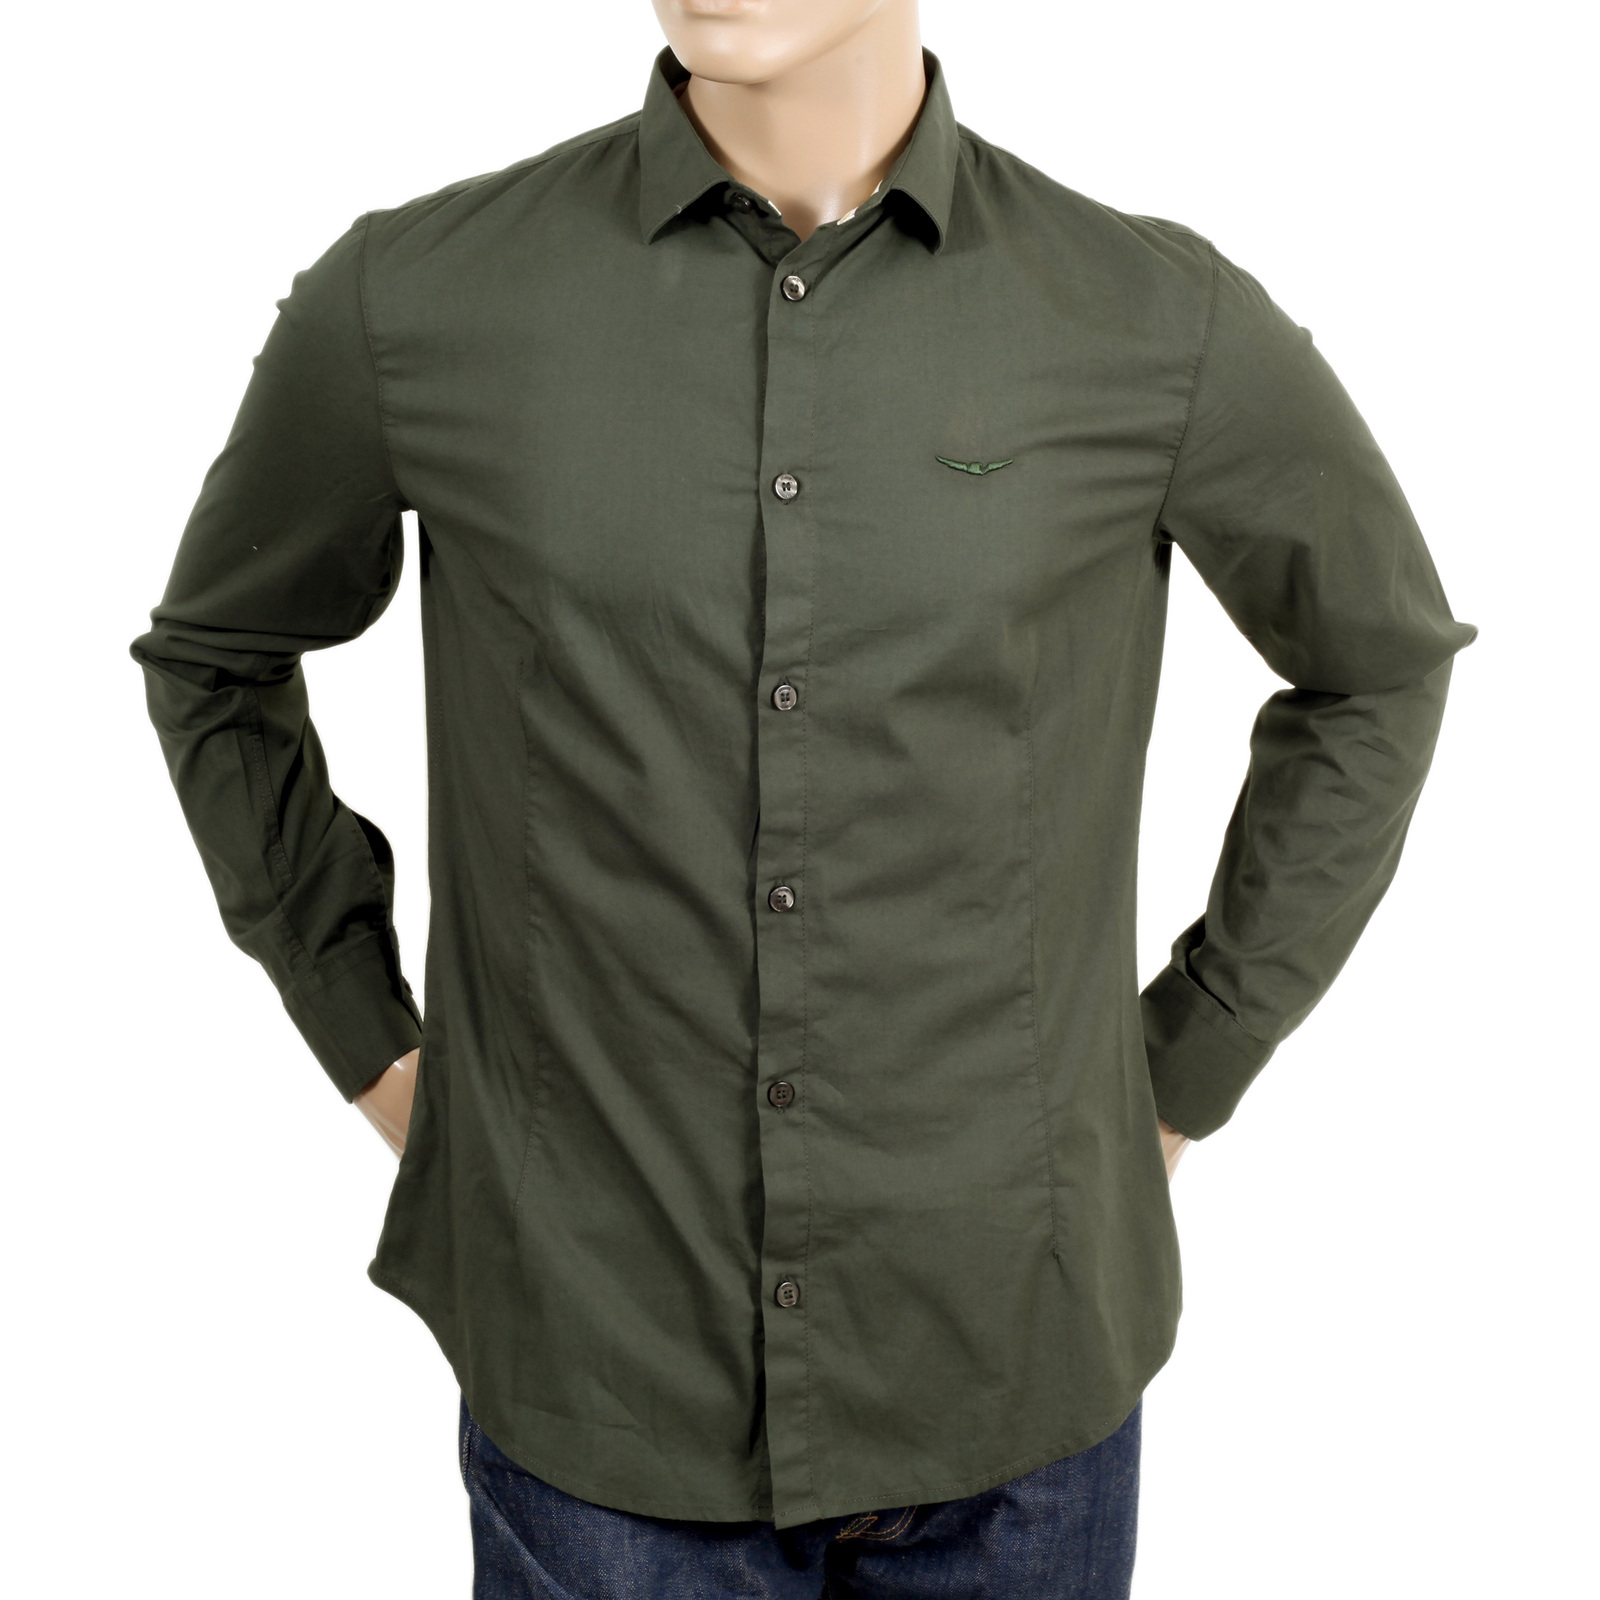 492feb08 Shop Armani Jeans Slim fit green shirt | togged